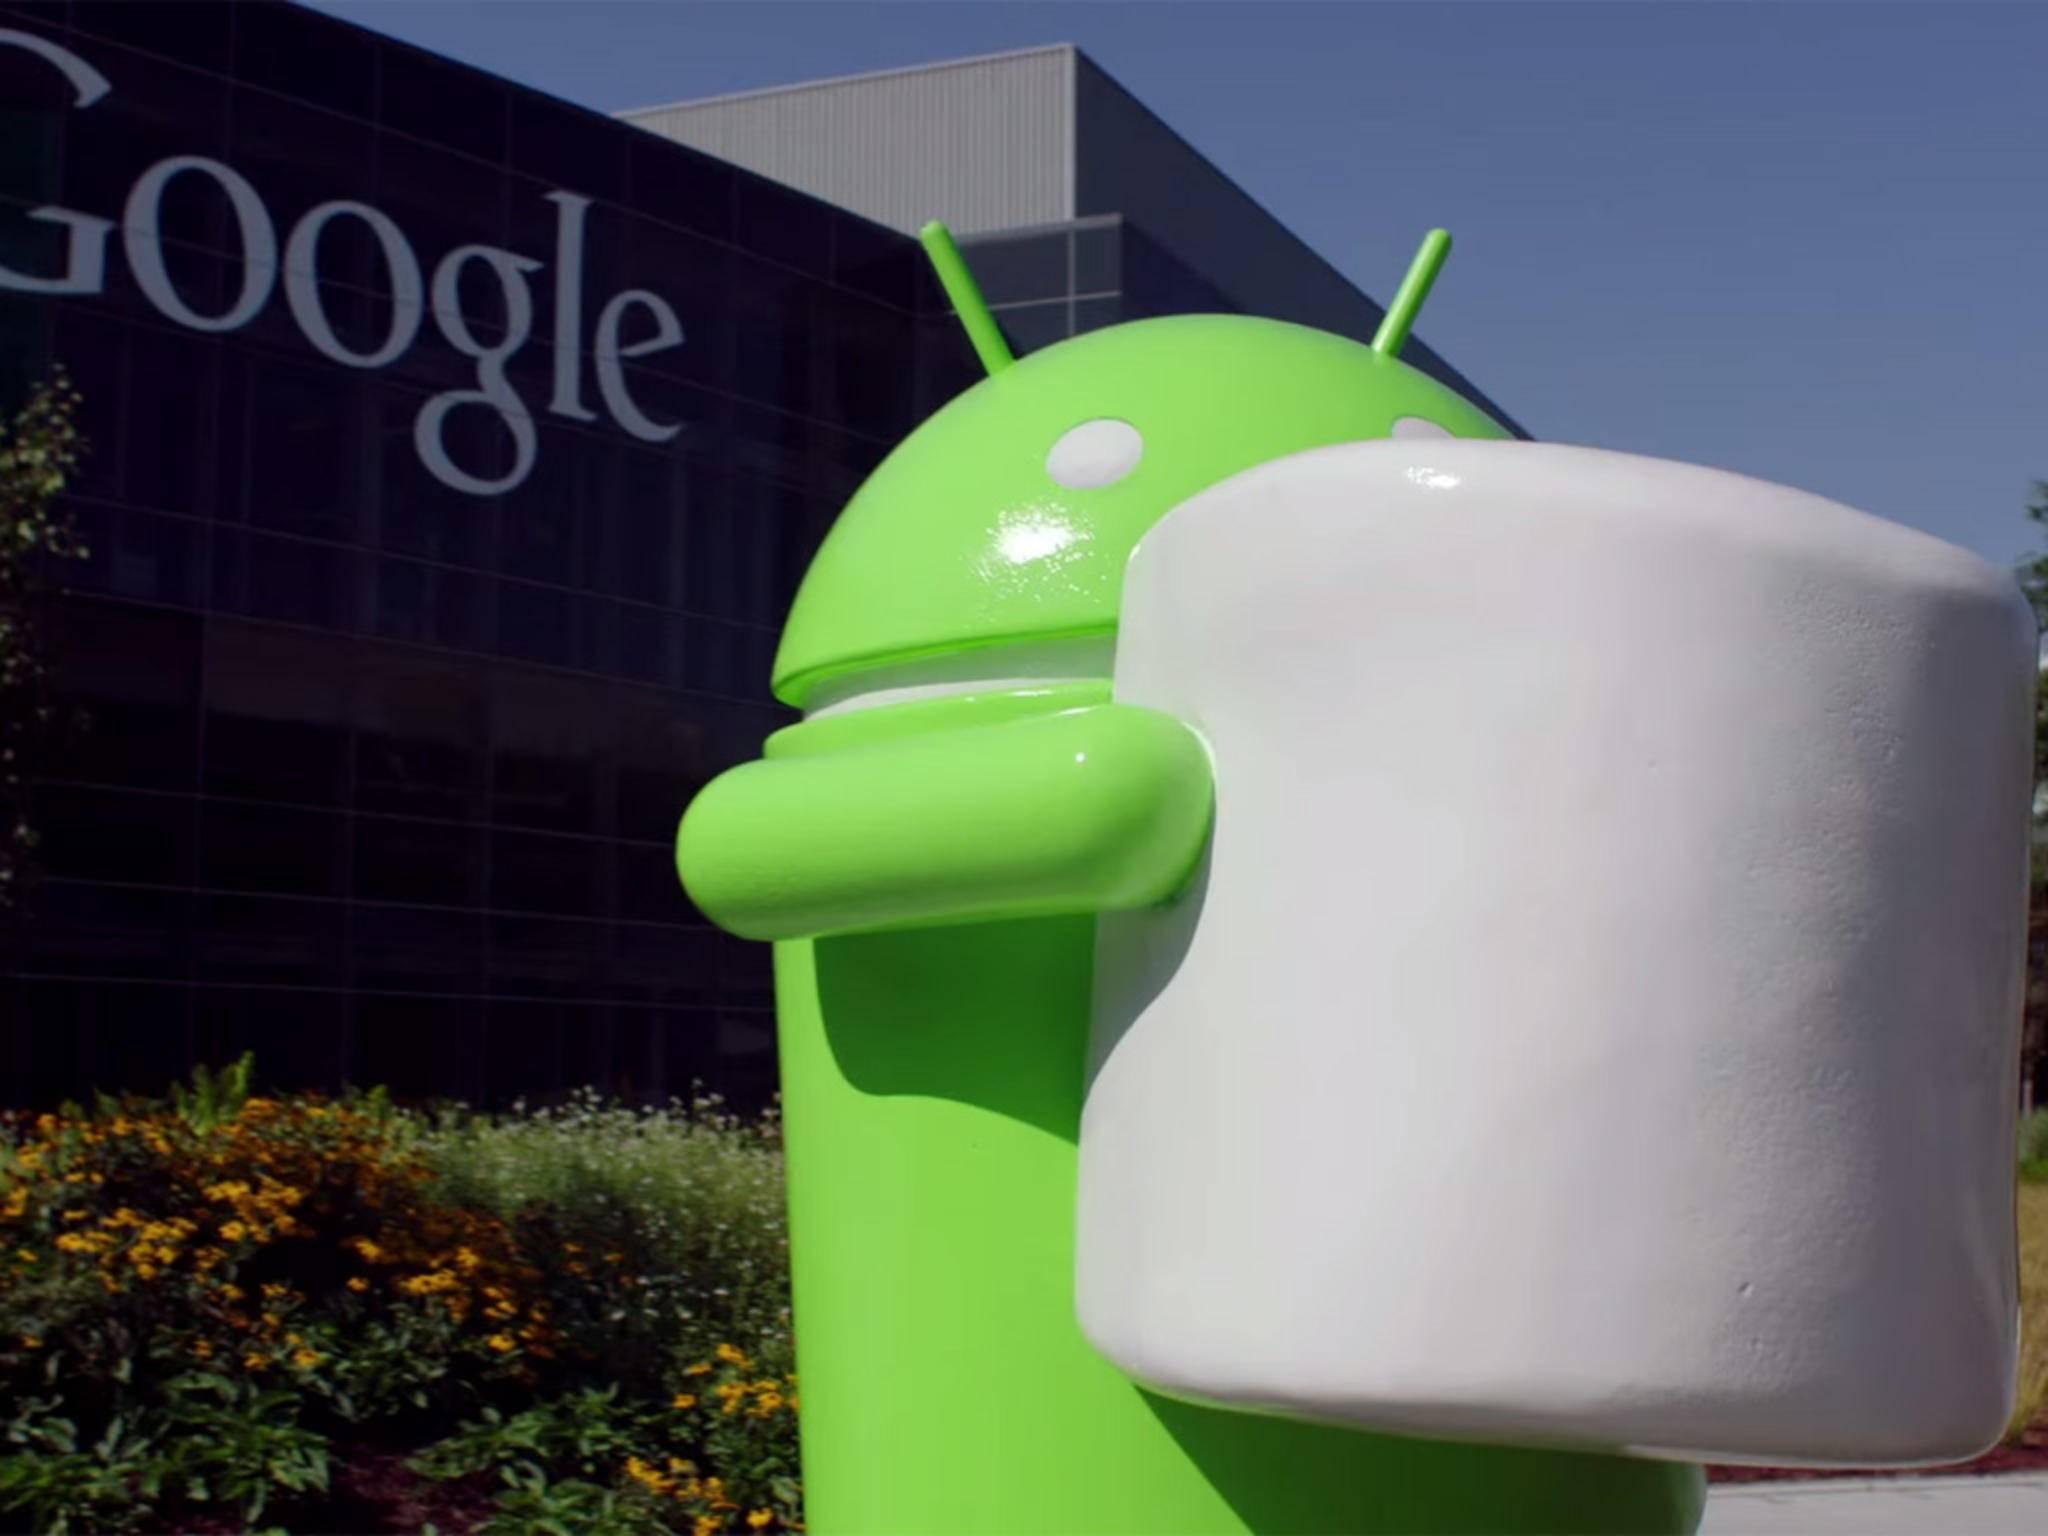 Schon ab dem 5. Oktober könnte Android Marshmallows rösten.